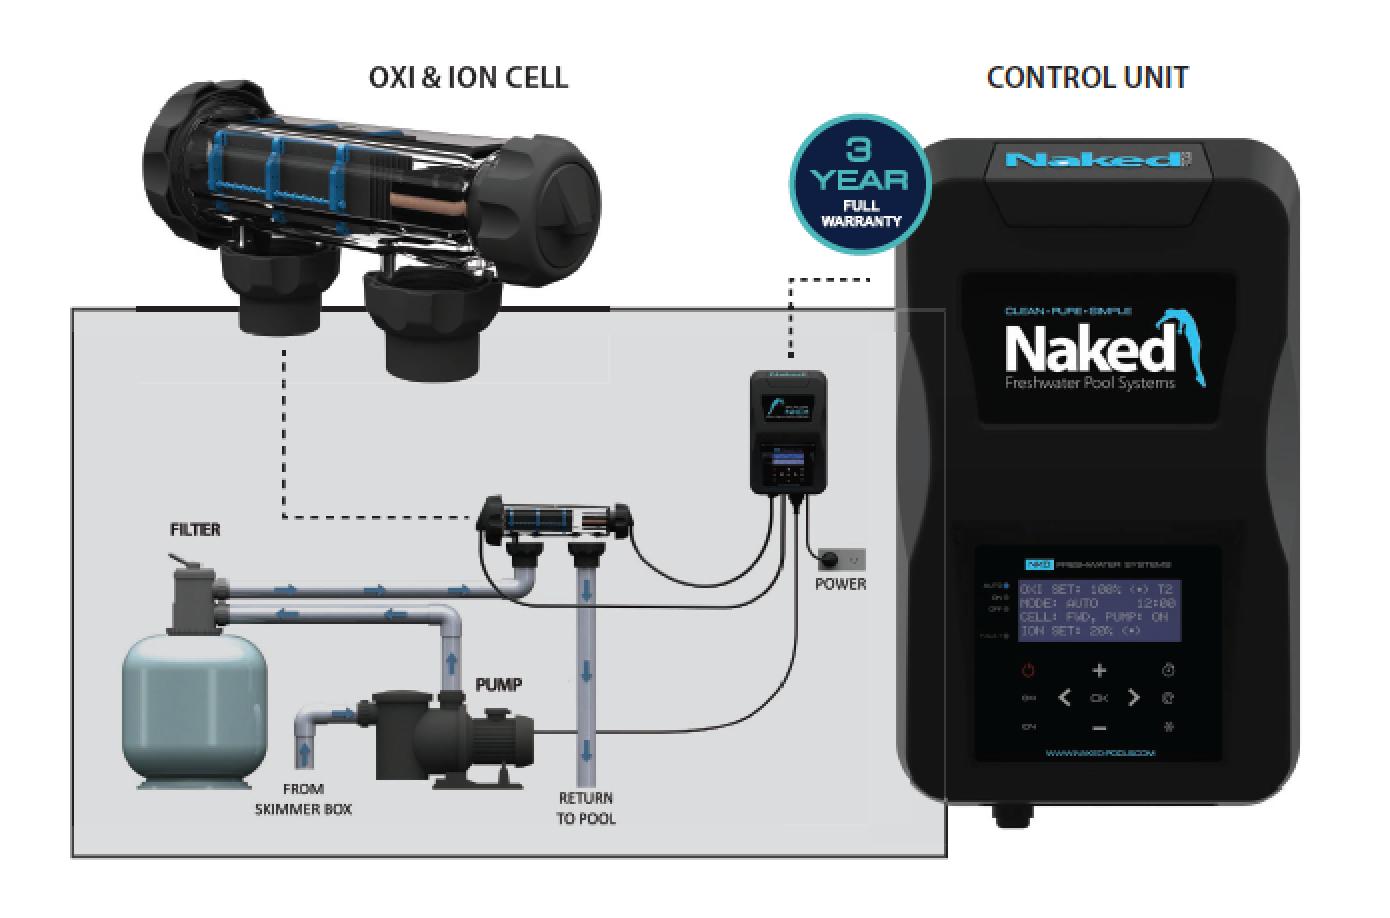 The Naked Hybrid System